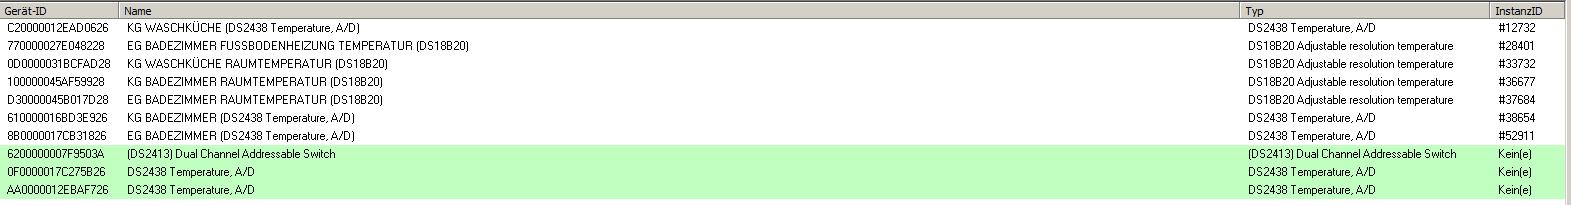 1Wire-Sensoren-Konfigurator-Liste.PNG